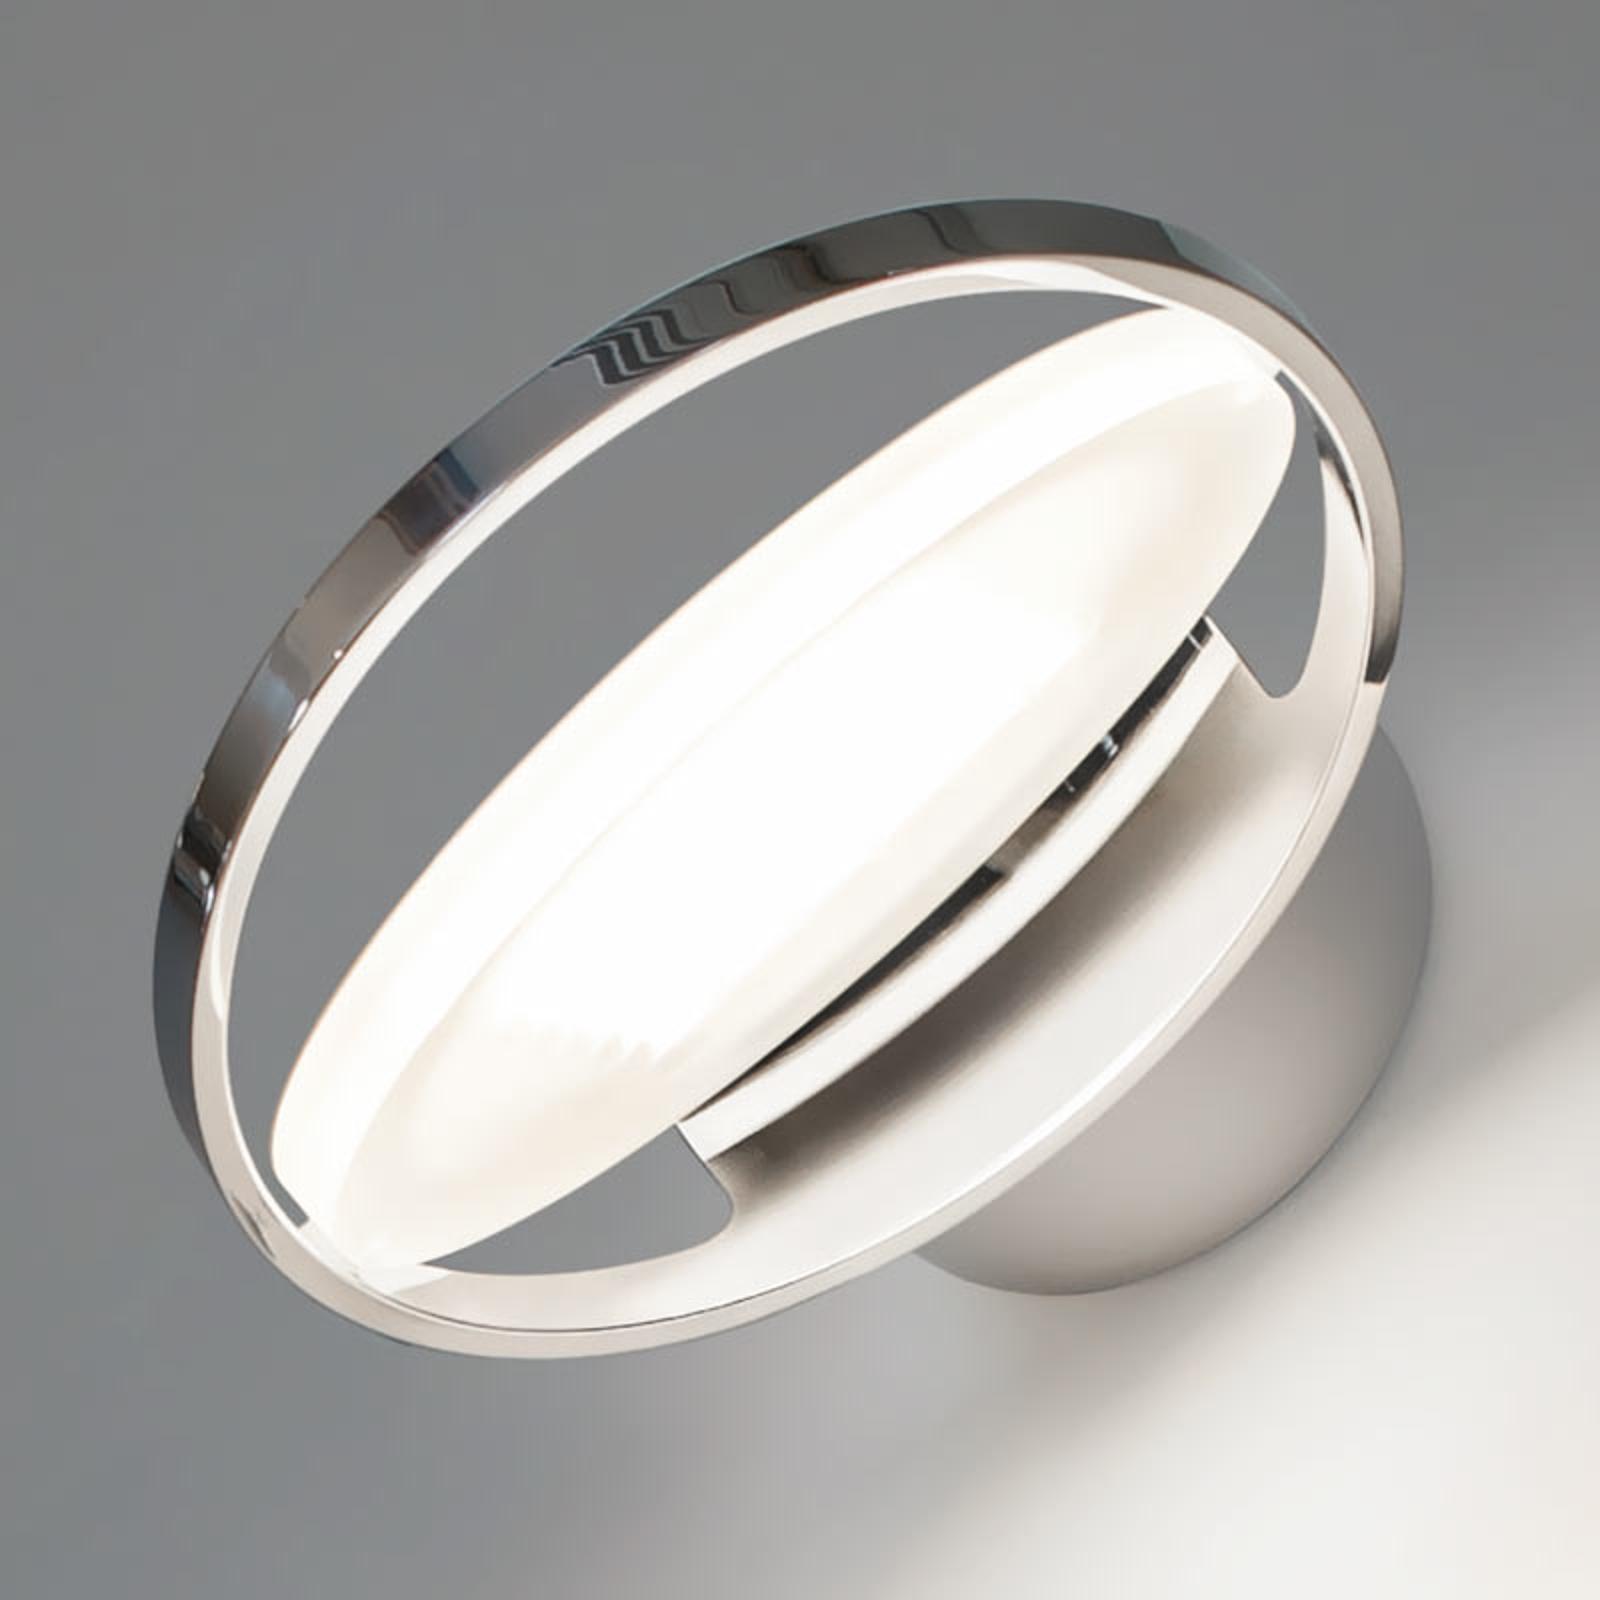 Nimbus Rim R 36 LED-seinävalaisin, kromi